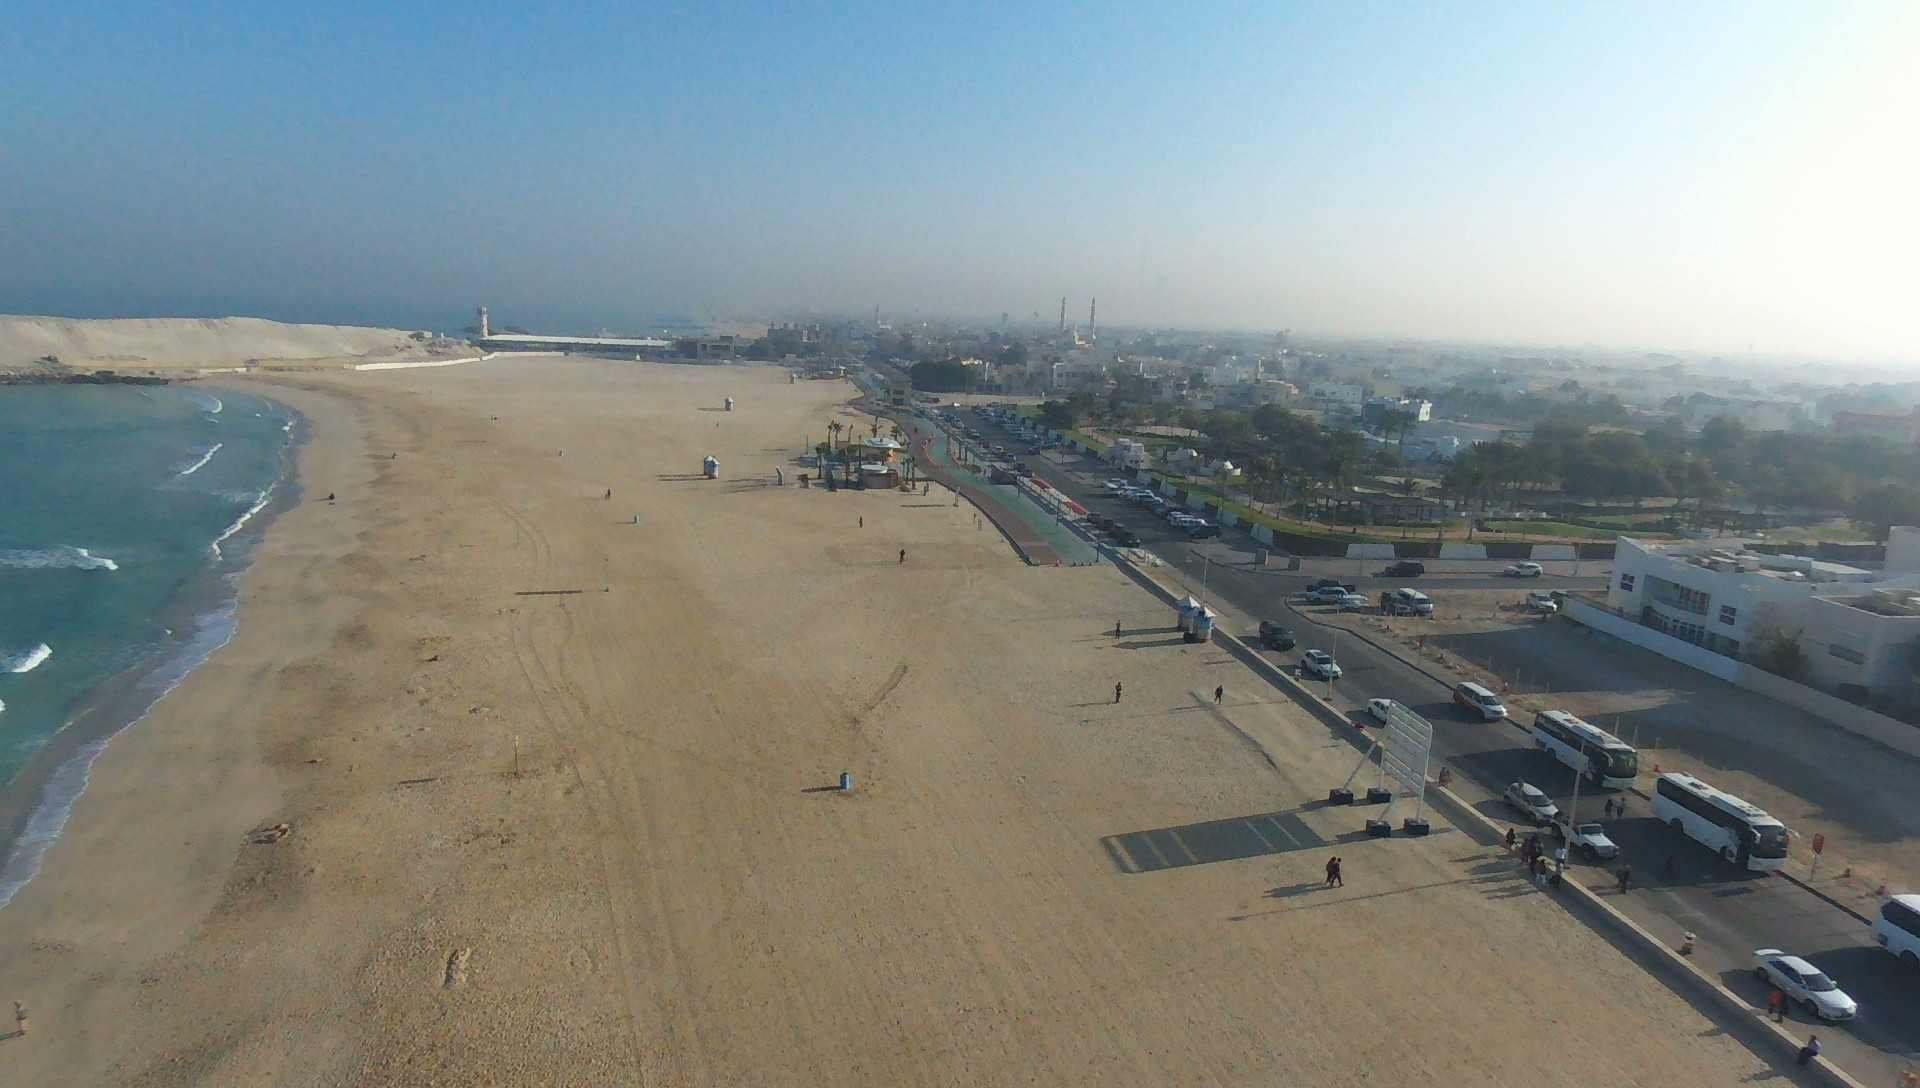 Acheter avis drone speed track rc 106 drone avec camera full hd